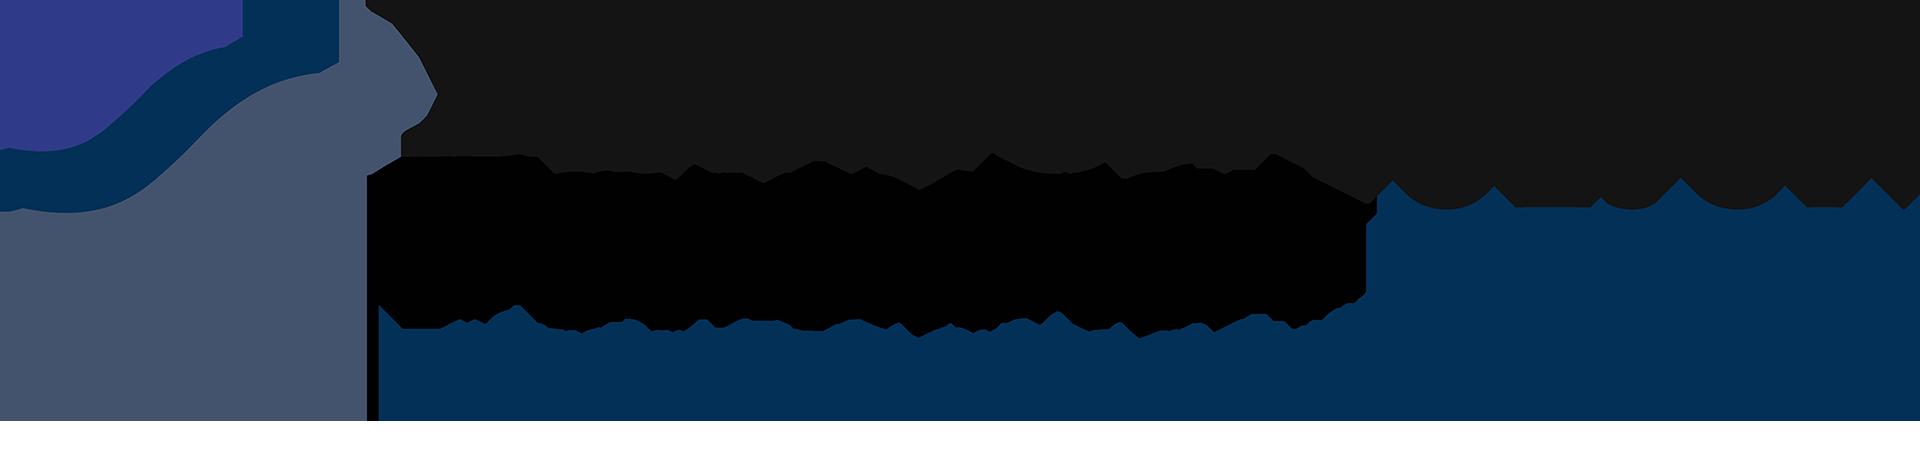 Brandon Tolson Foundation